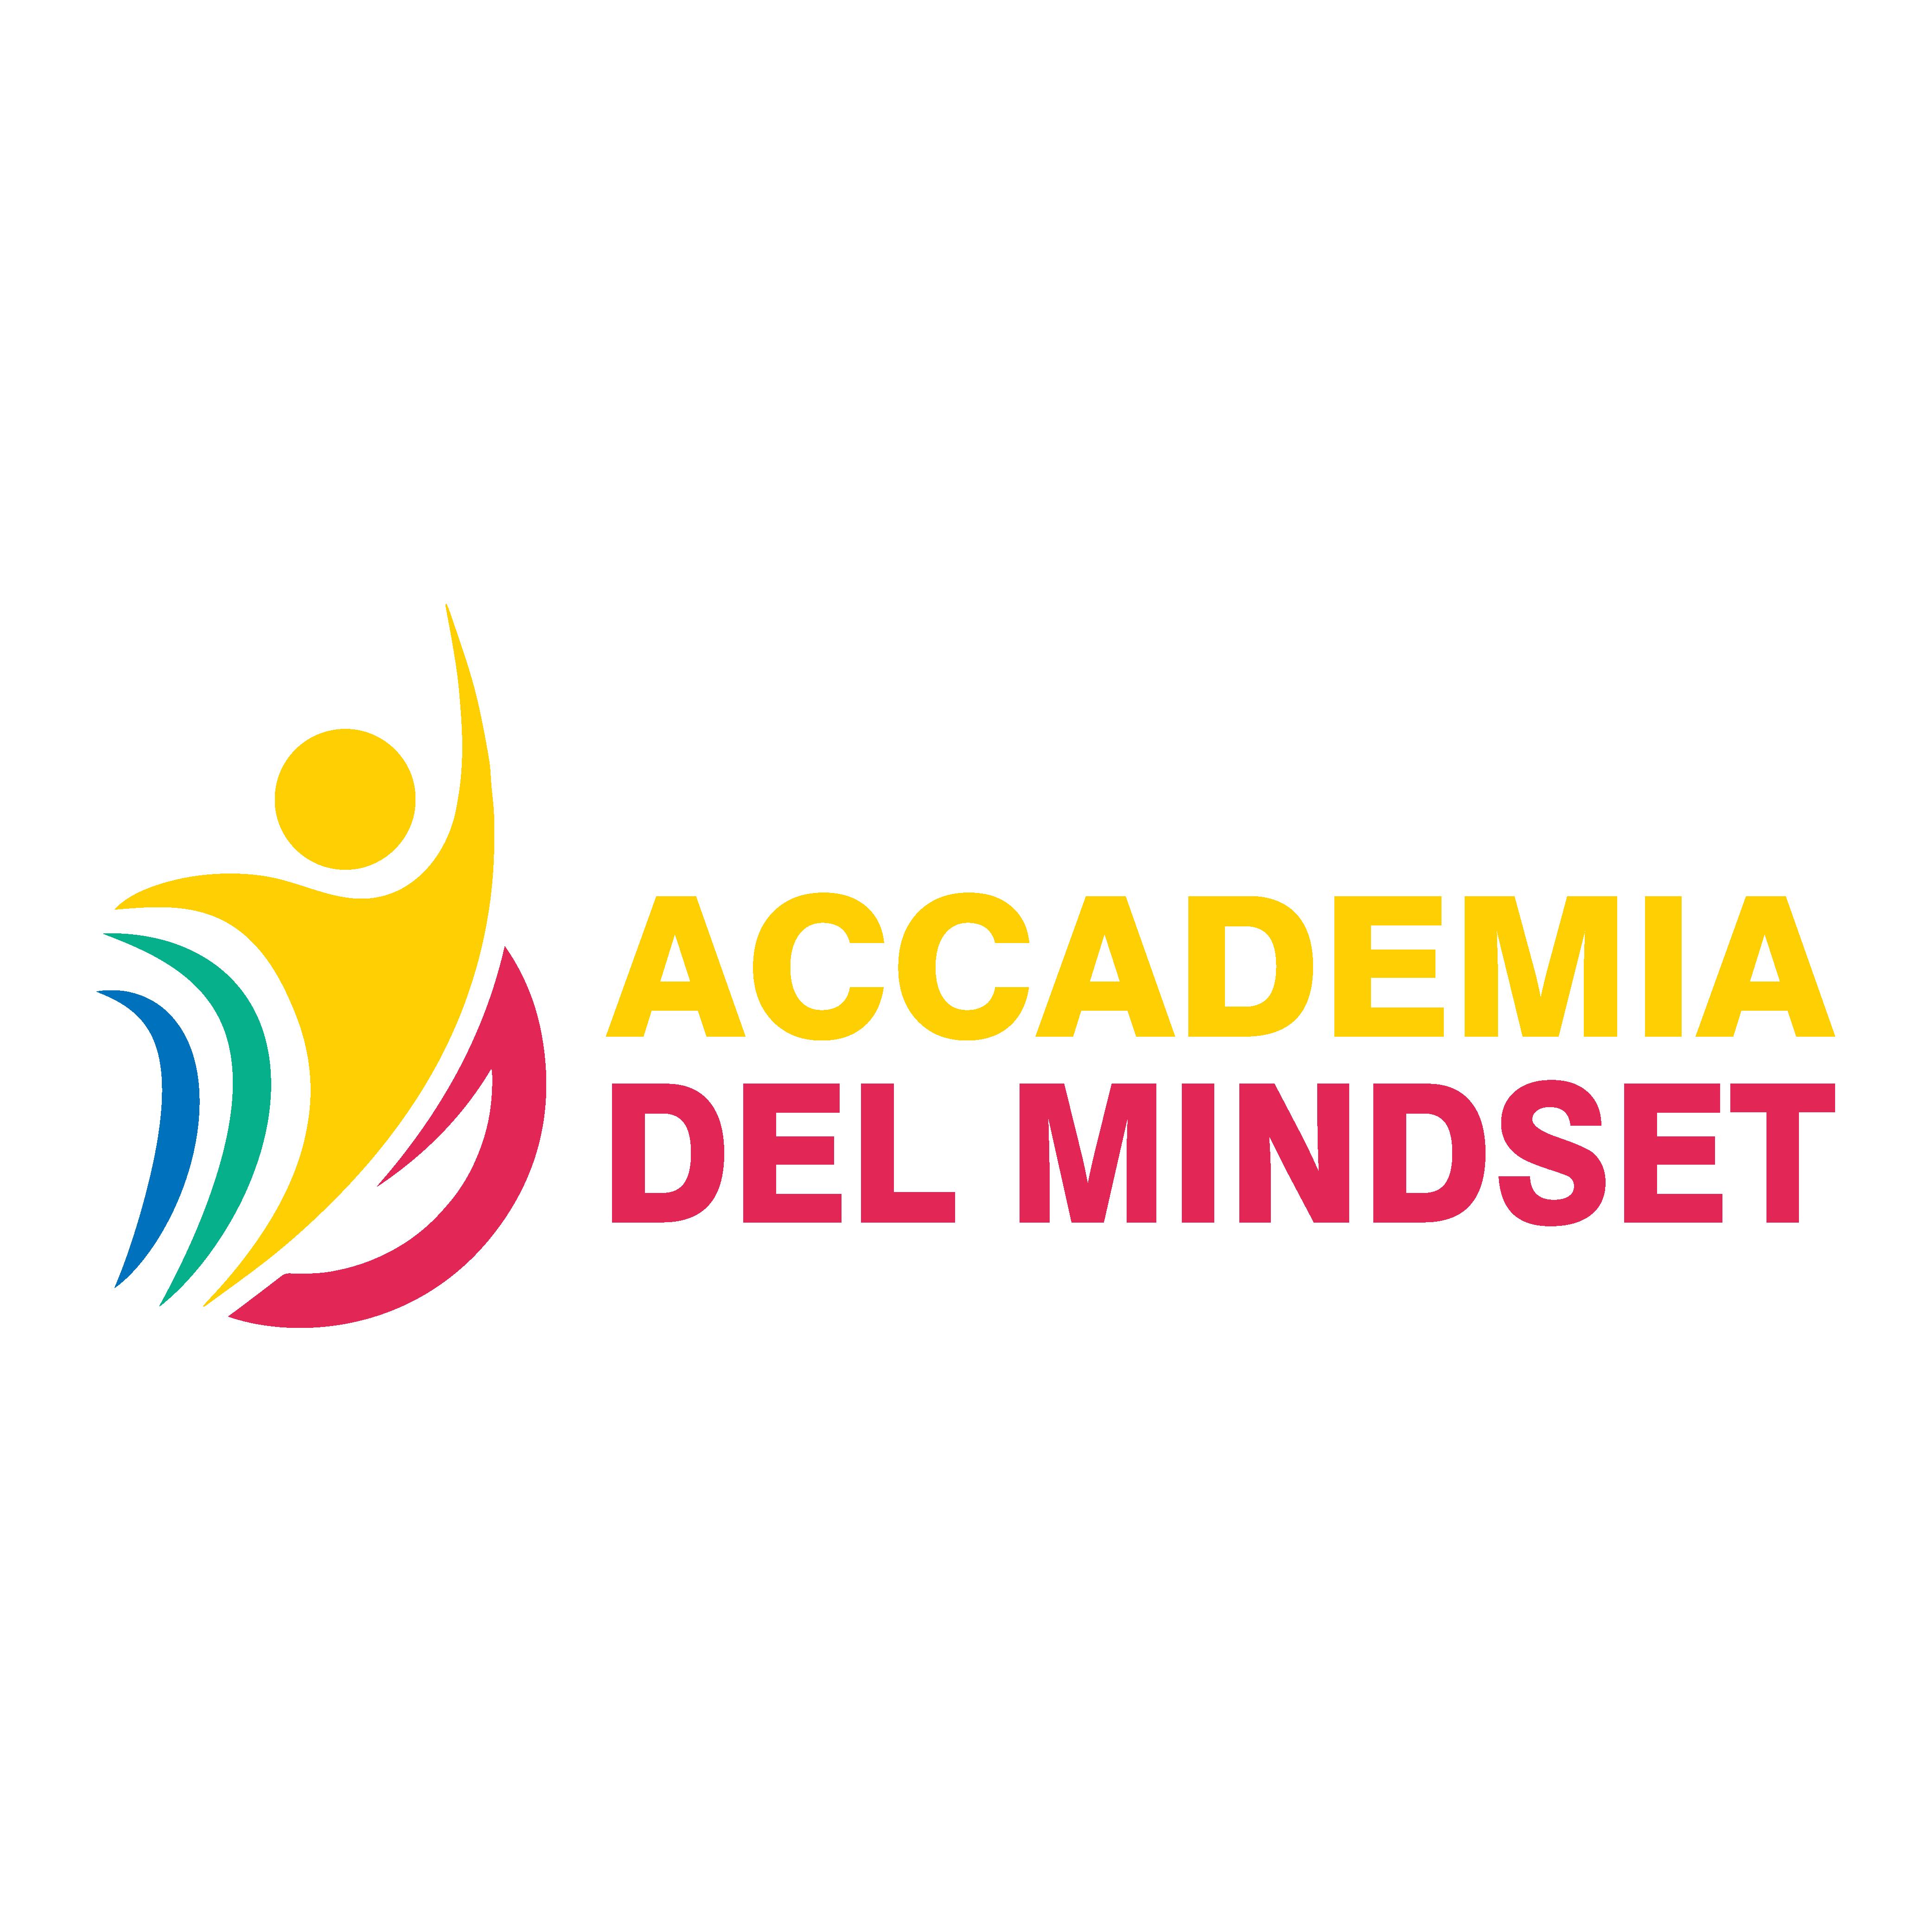 Accademia del Mindset